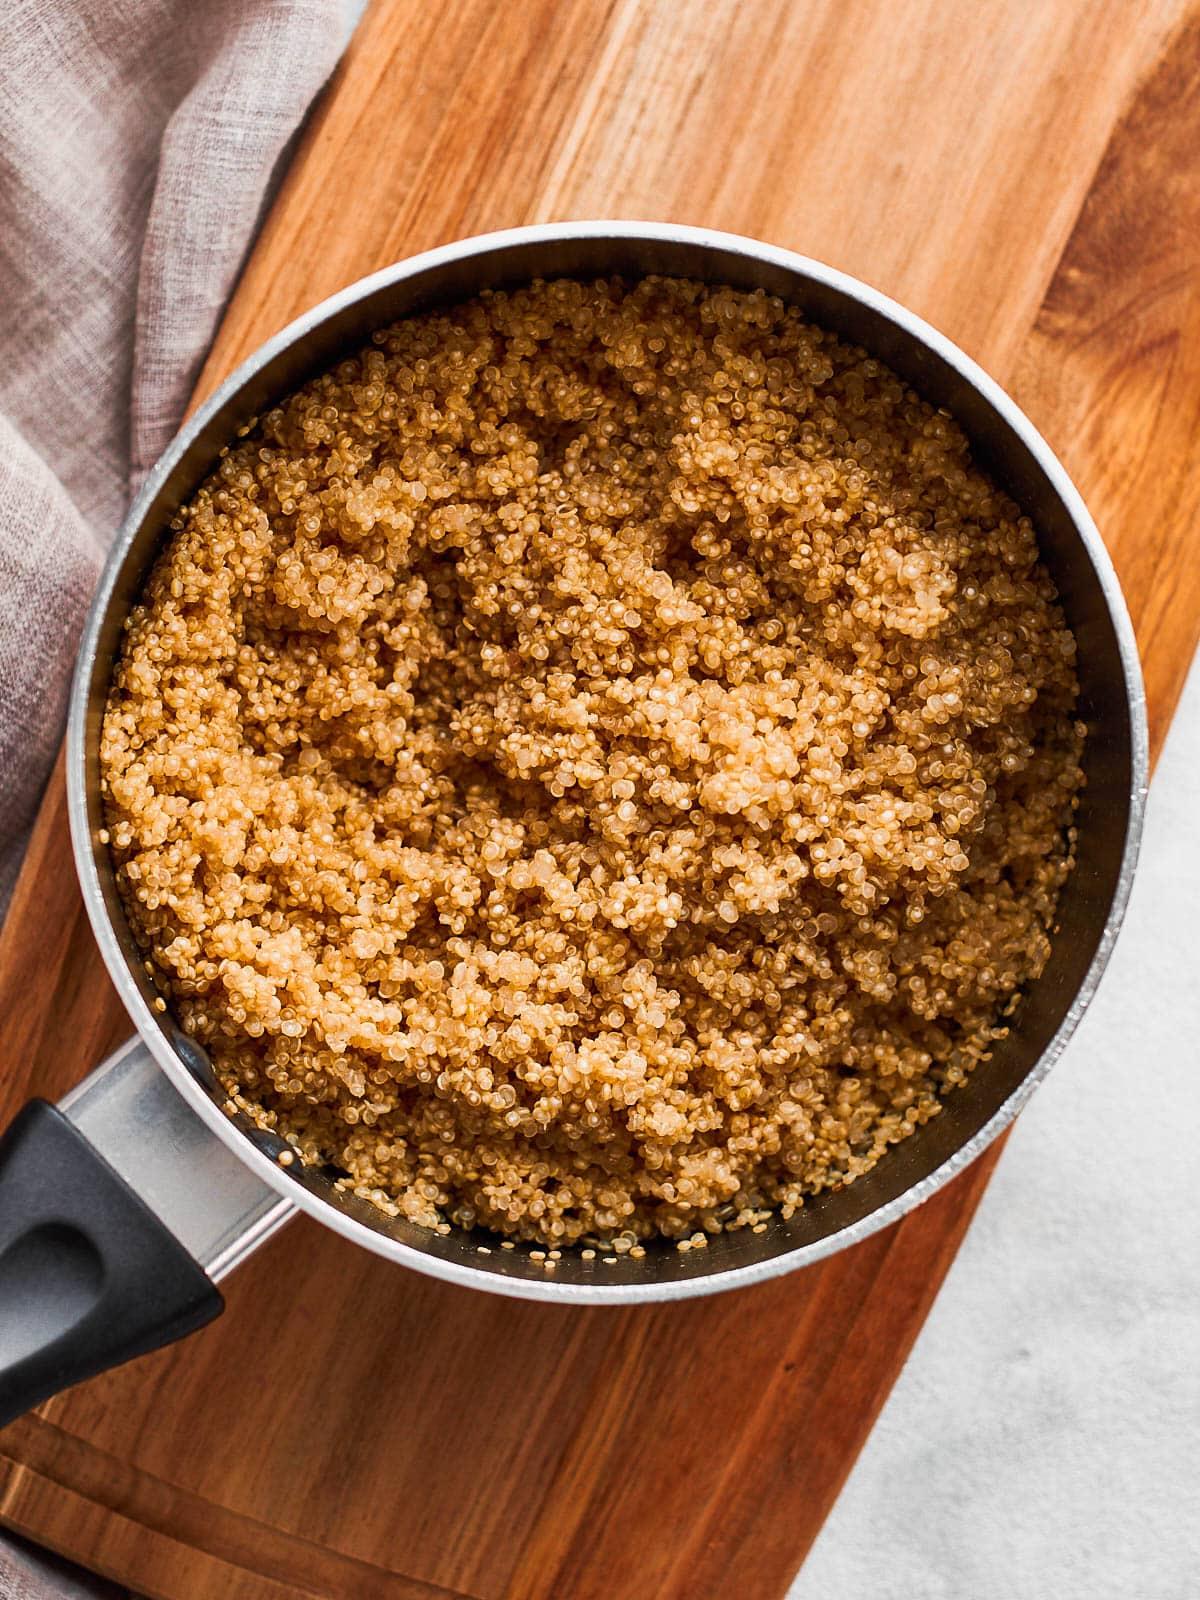 Cooked quinoa in a saucepan